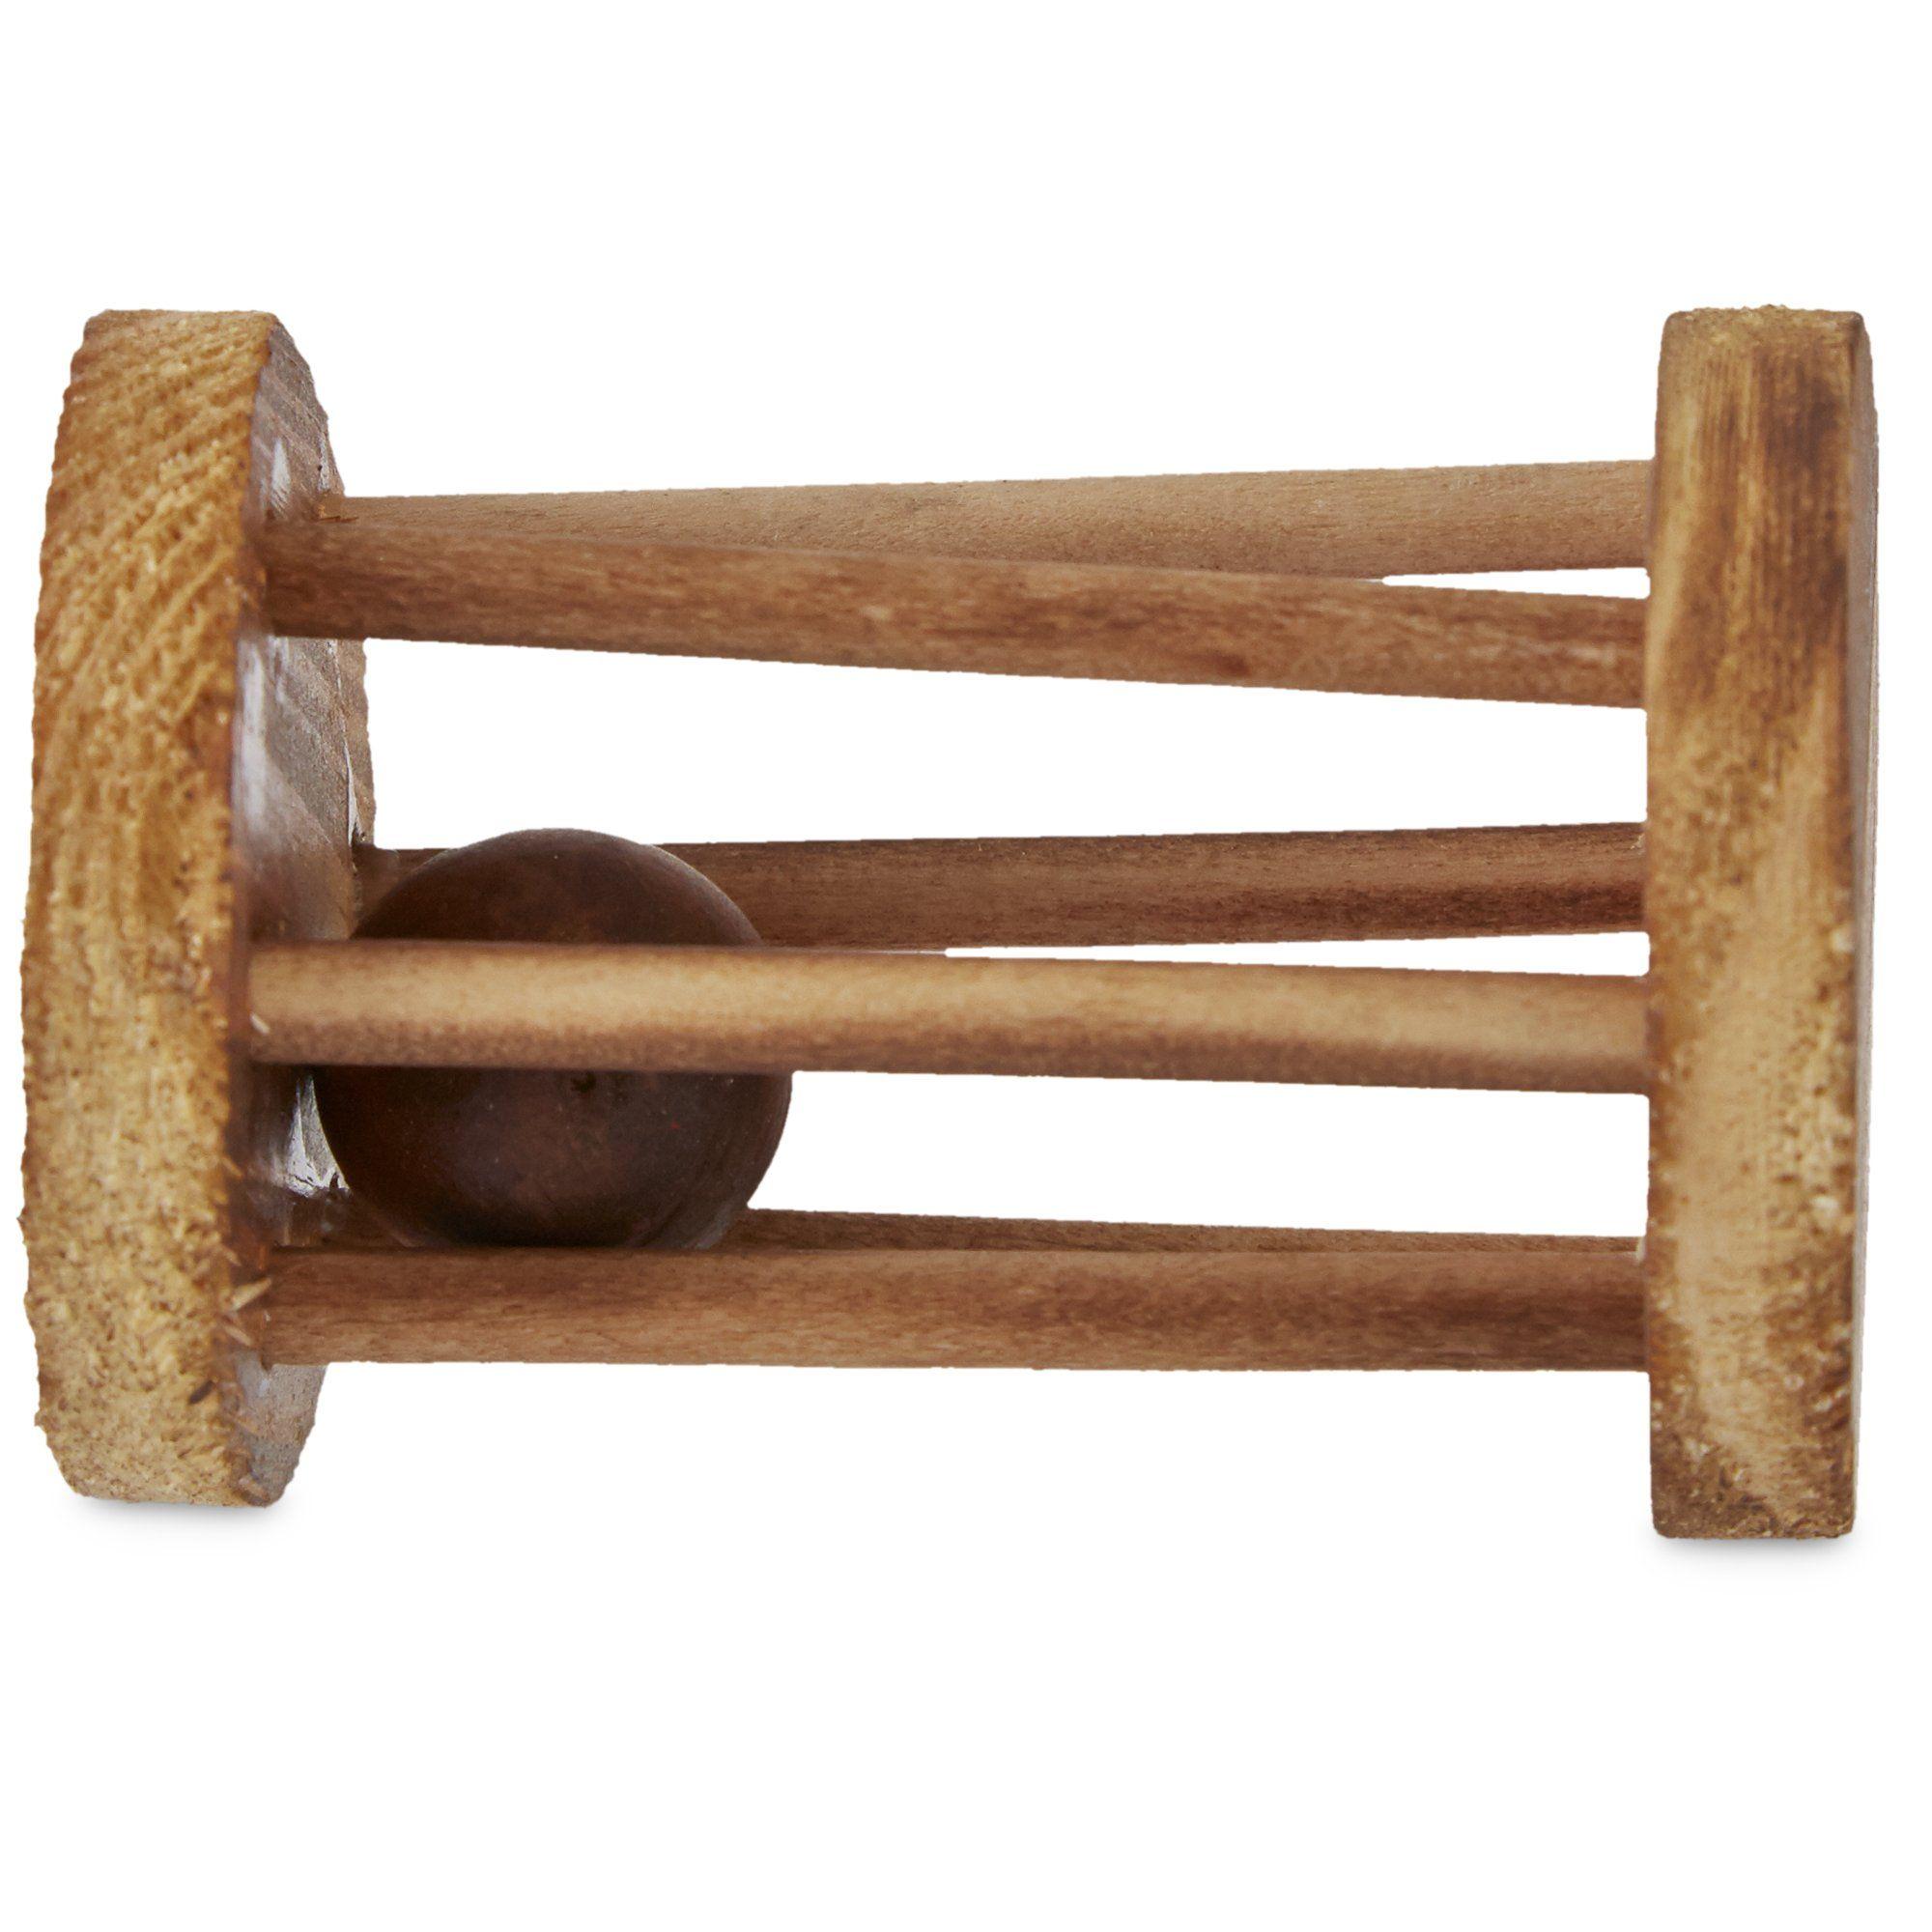 You & Me Wood Wheel with Ball Bird toys, Wild bird food